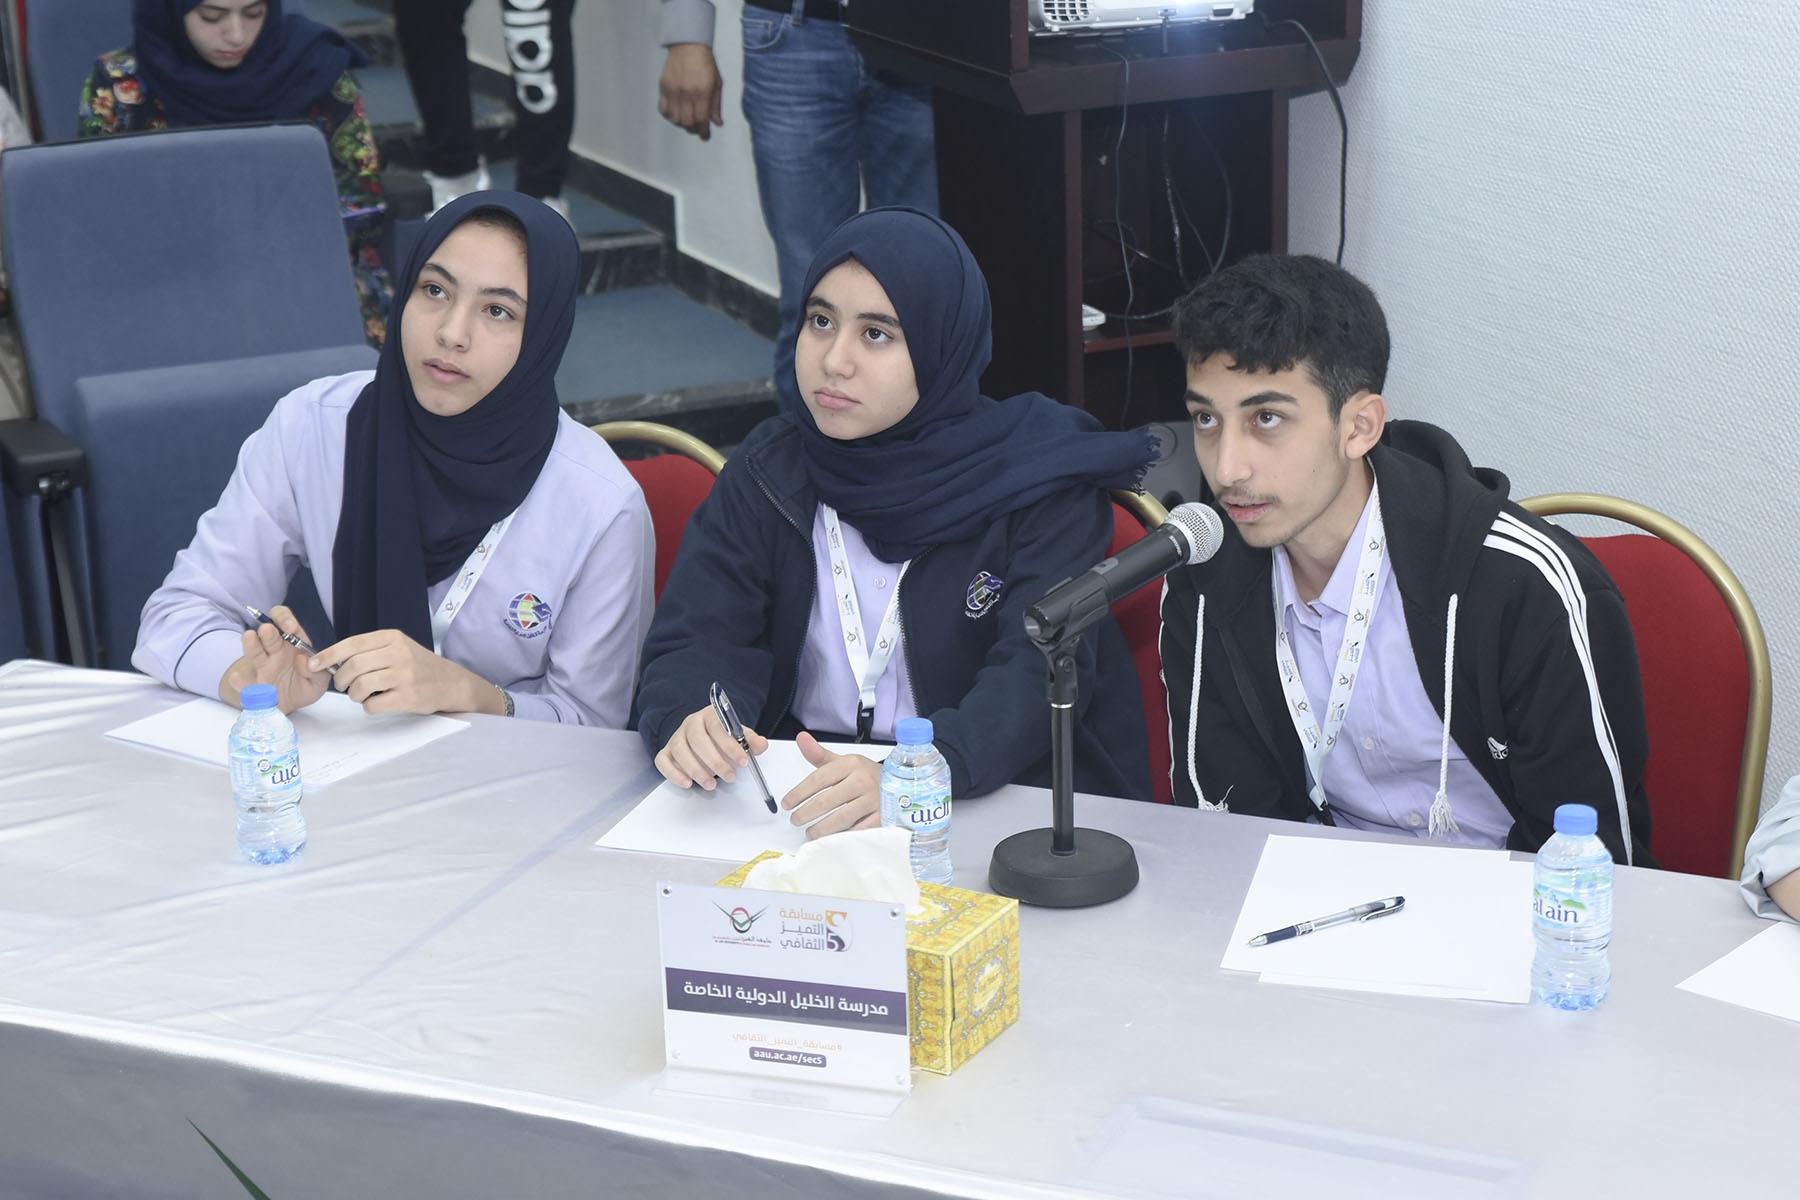 Second Day (Al Khalil International Private School VS Al Awael Private School)